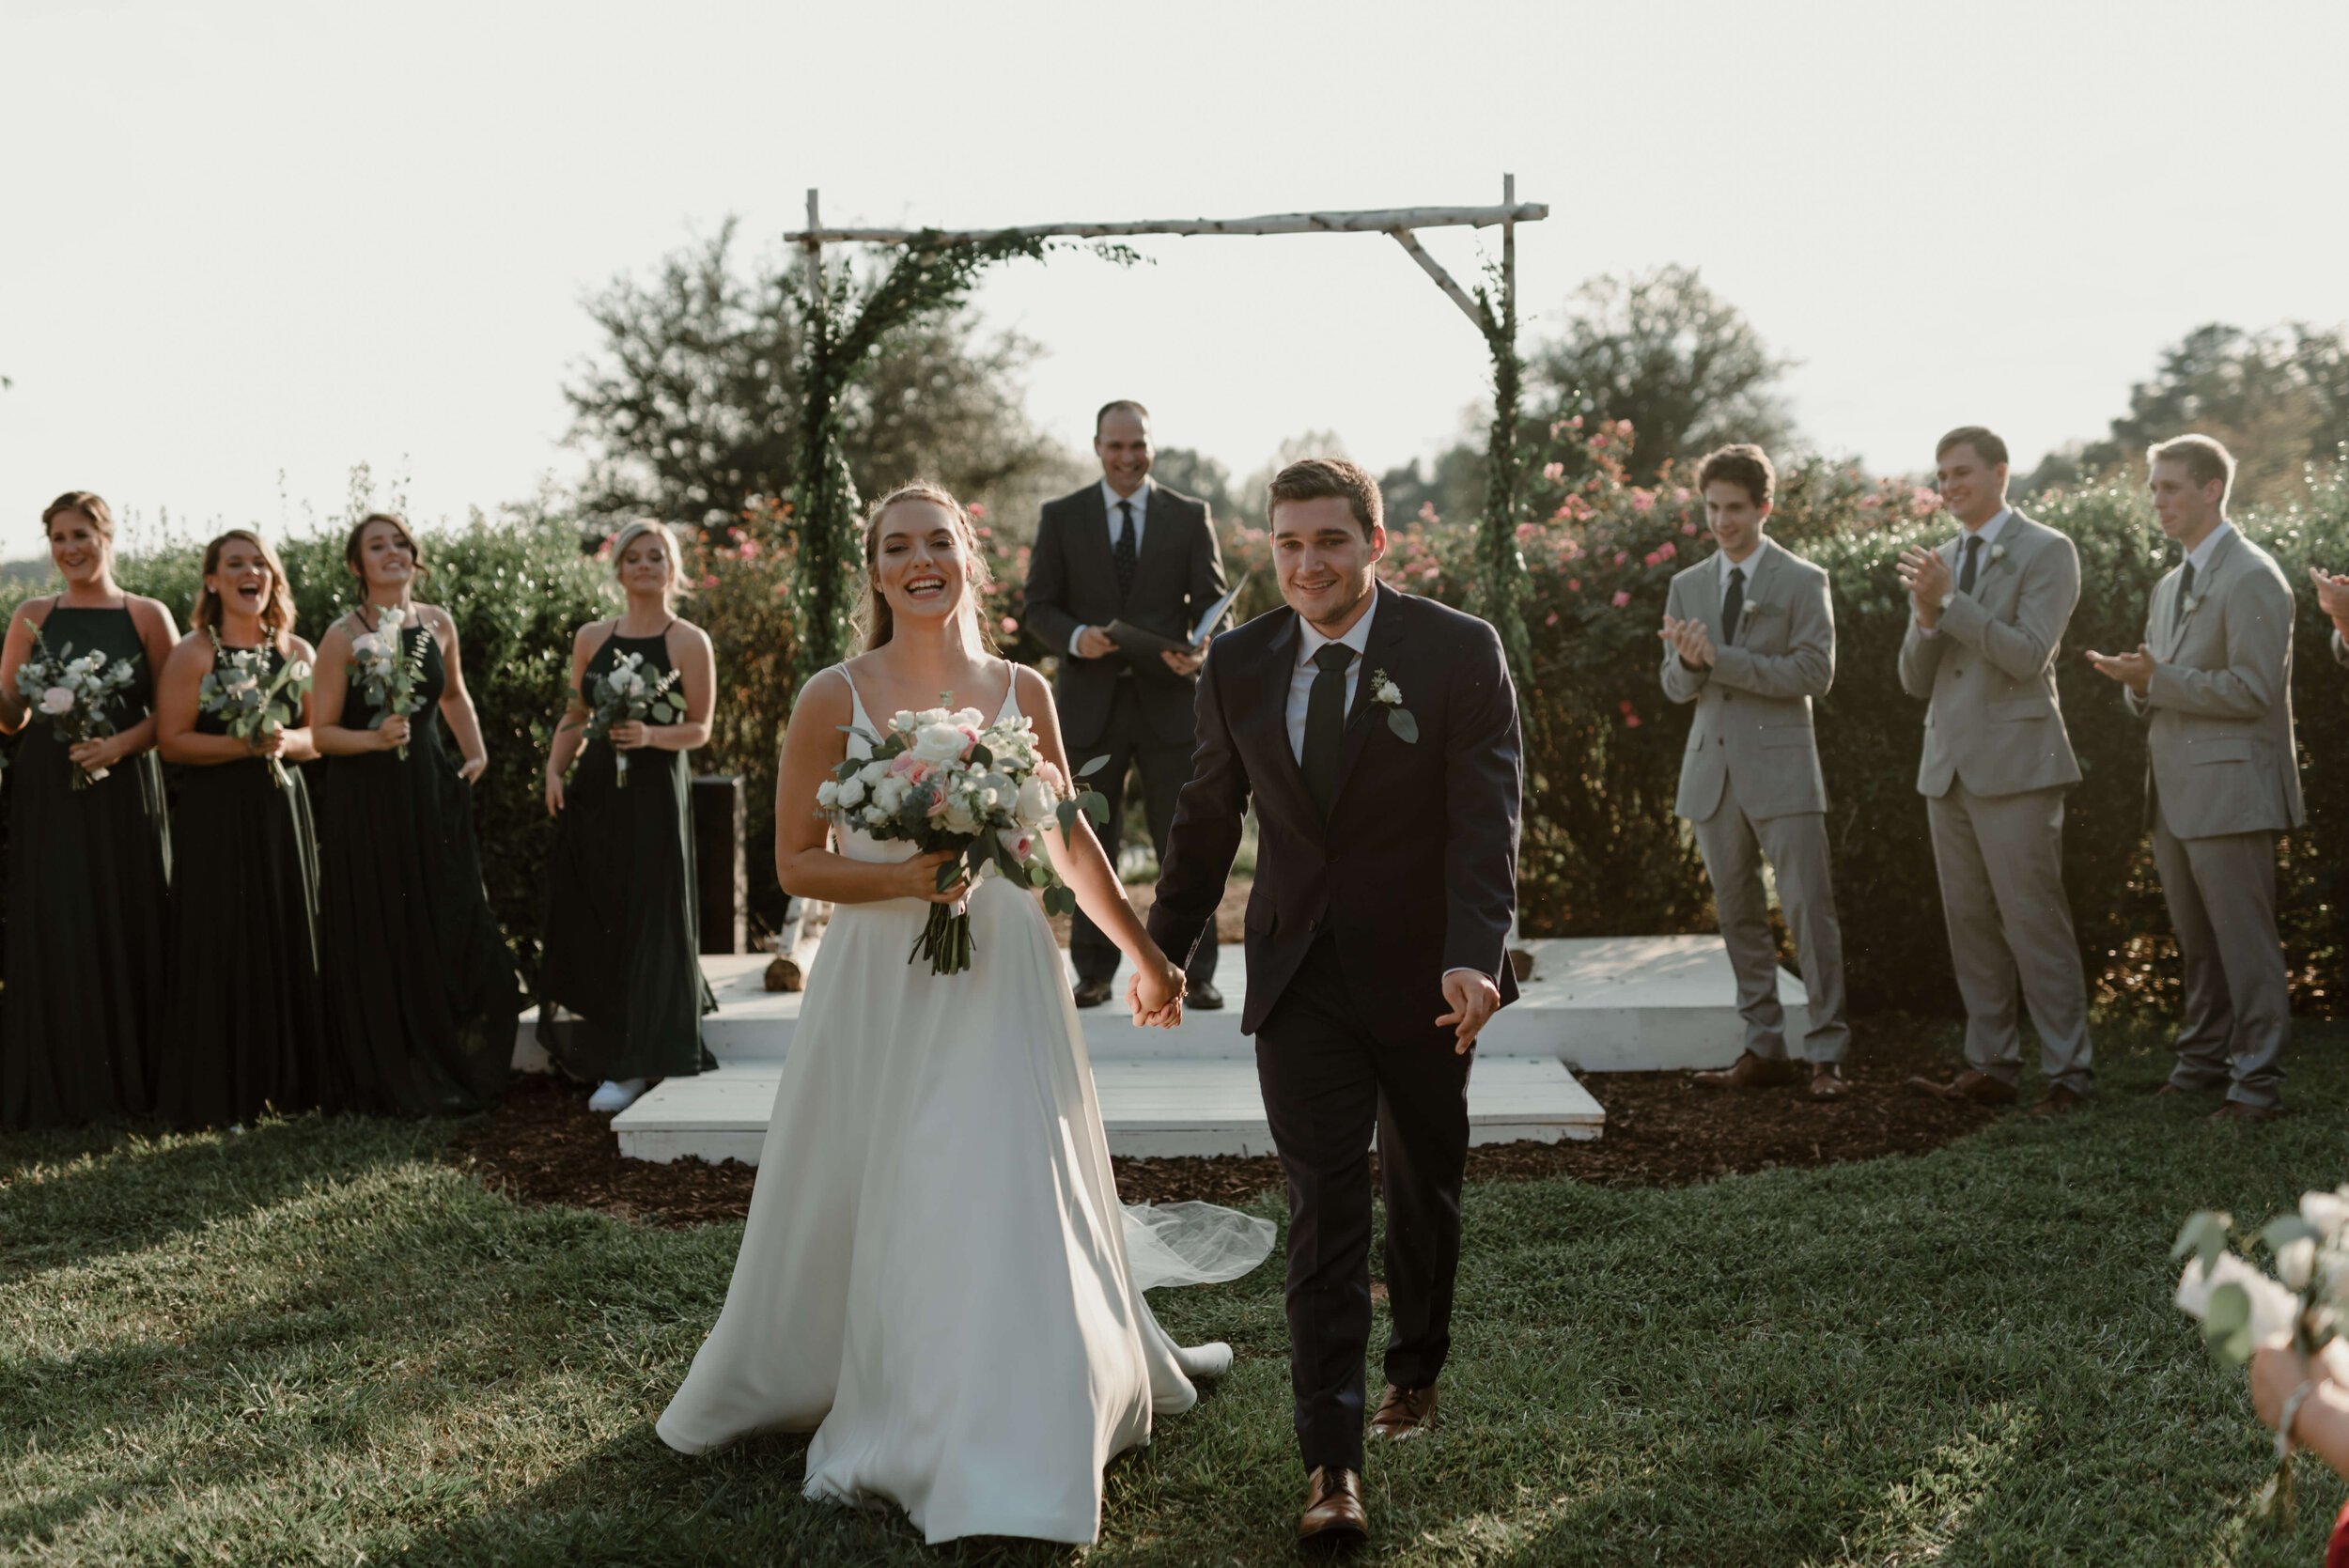 RALEIGH_WEDDING_GABBY_AND_SMITTYDSC_7748.jpg